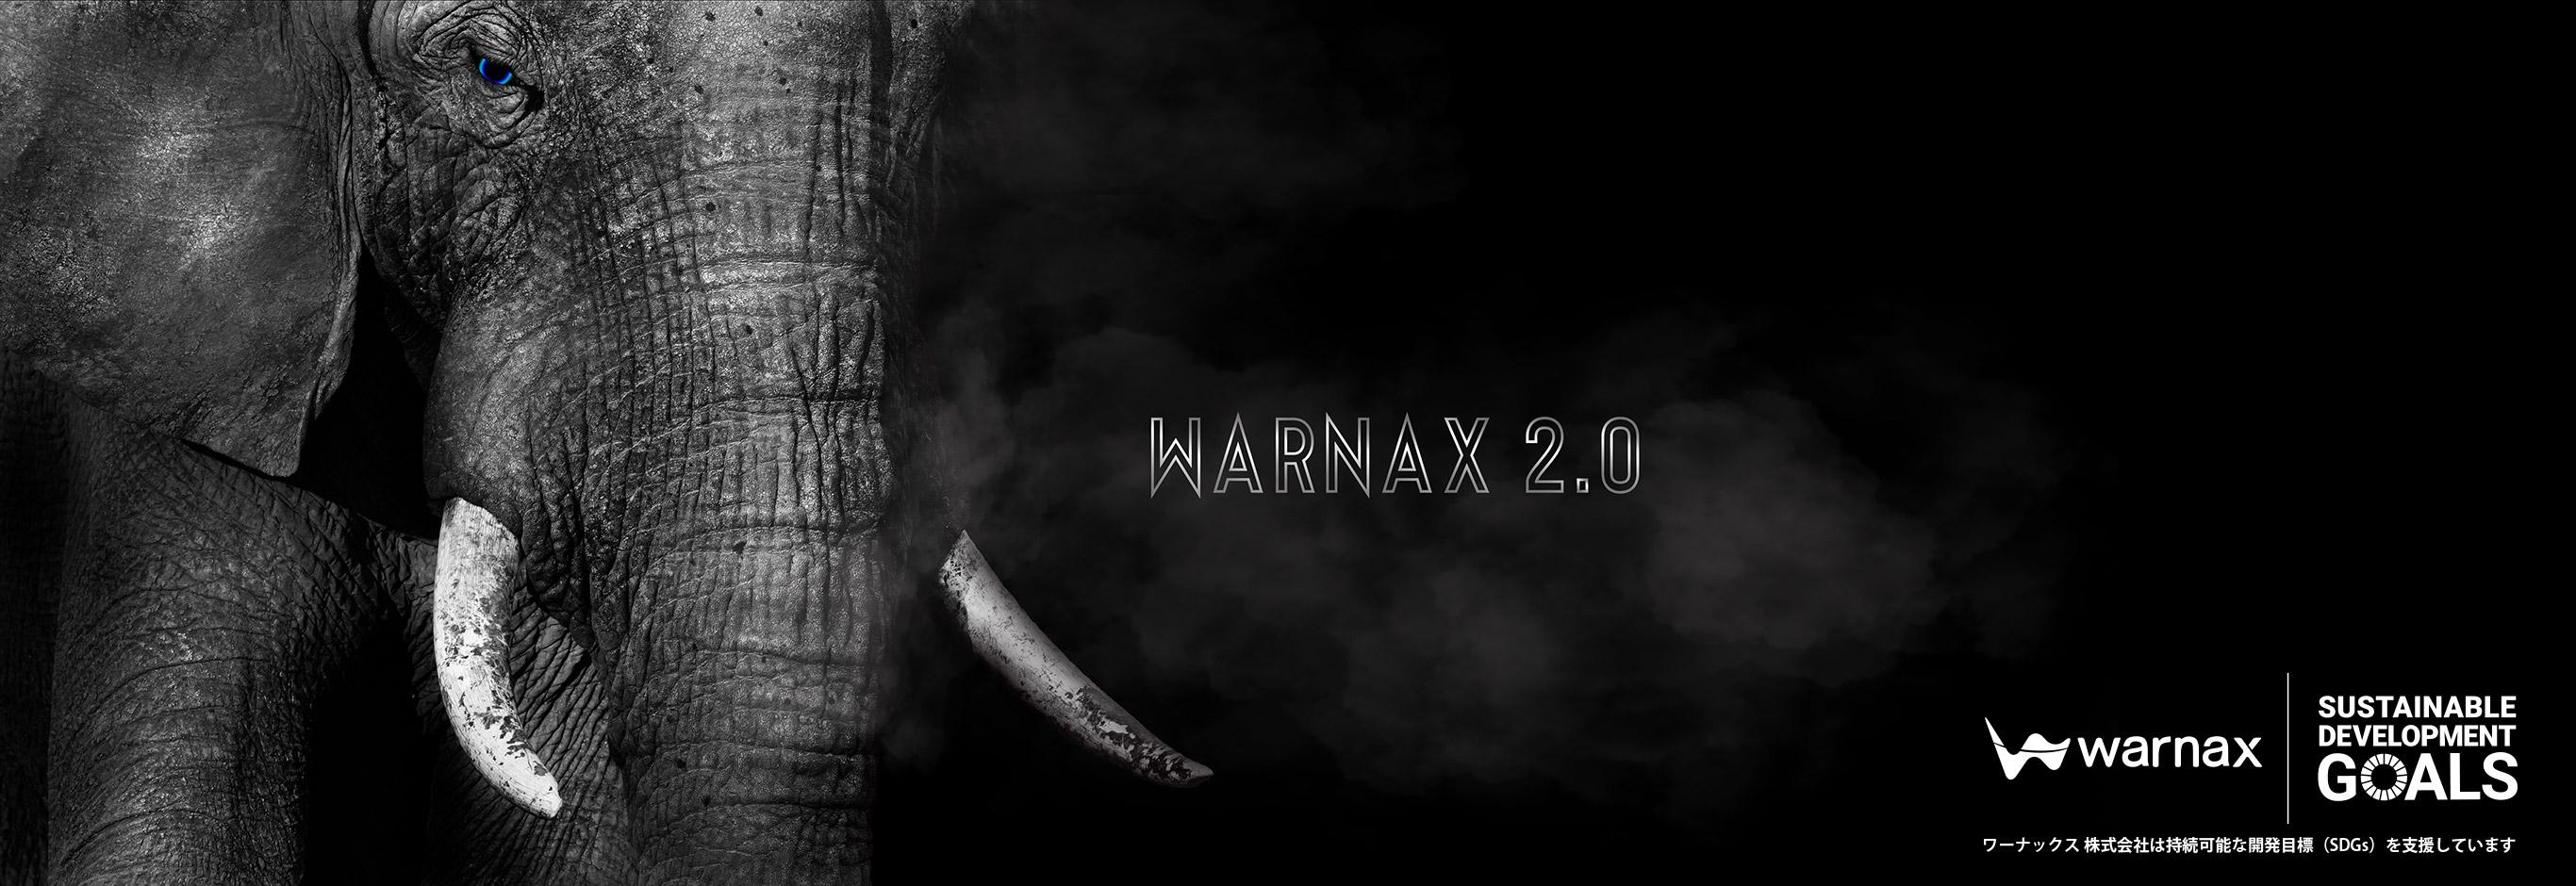 WARNAX2.0:WARNAXは、持続可能な開発目標(SDGs)の考え方を支援しています